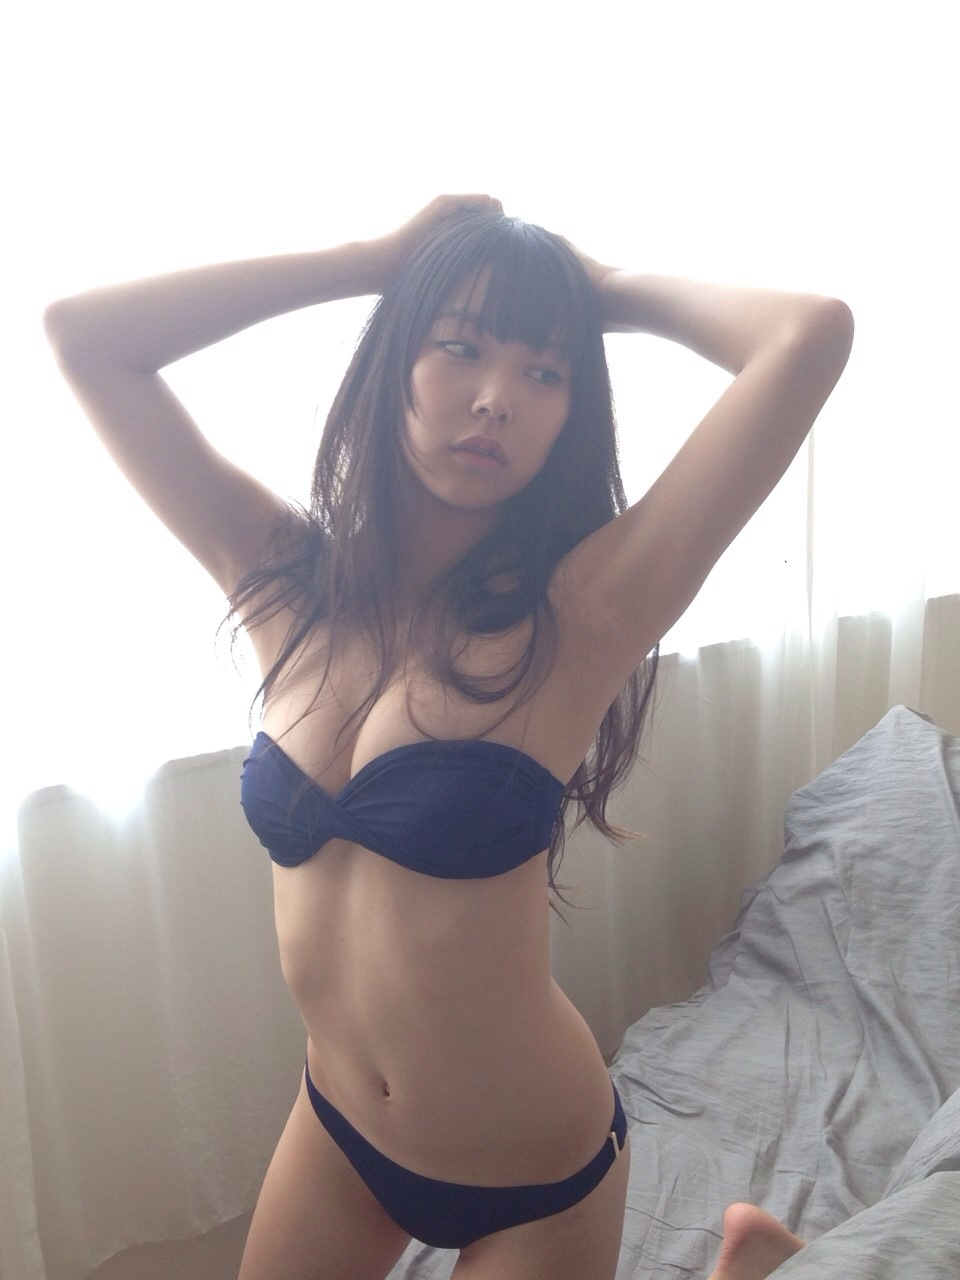 AKBグループ専用のワキ・脇・腋フェチスレfc2>1本 YouTube動画>2本 ->画像>1465枚